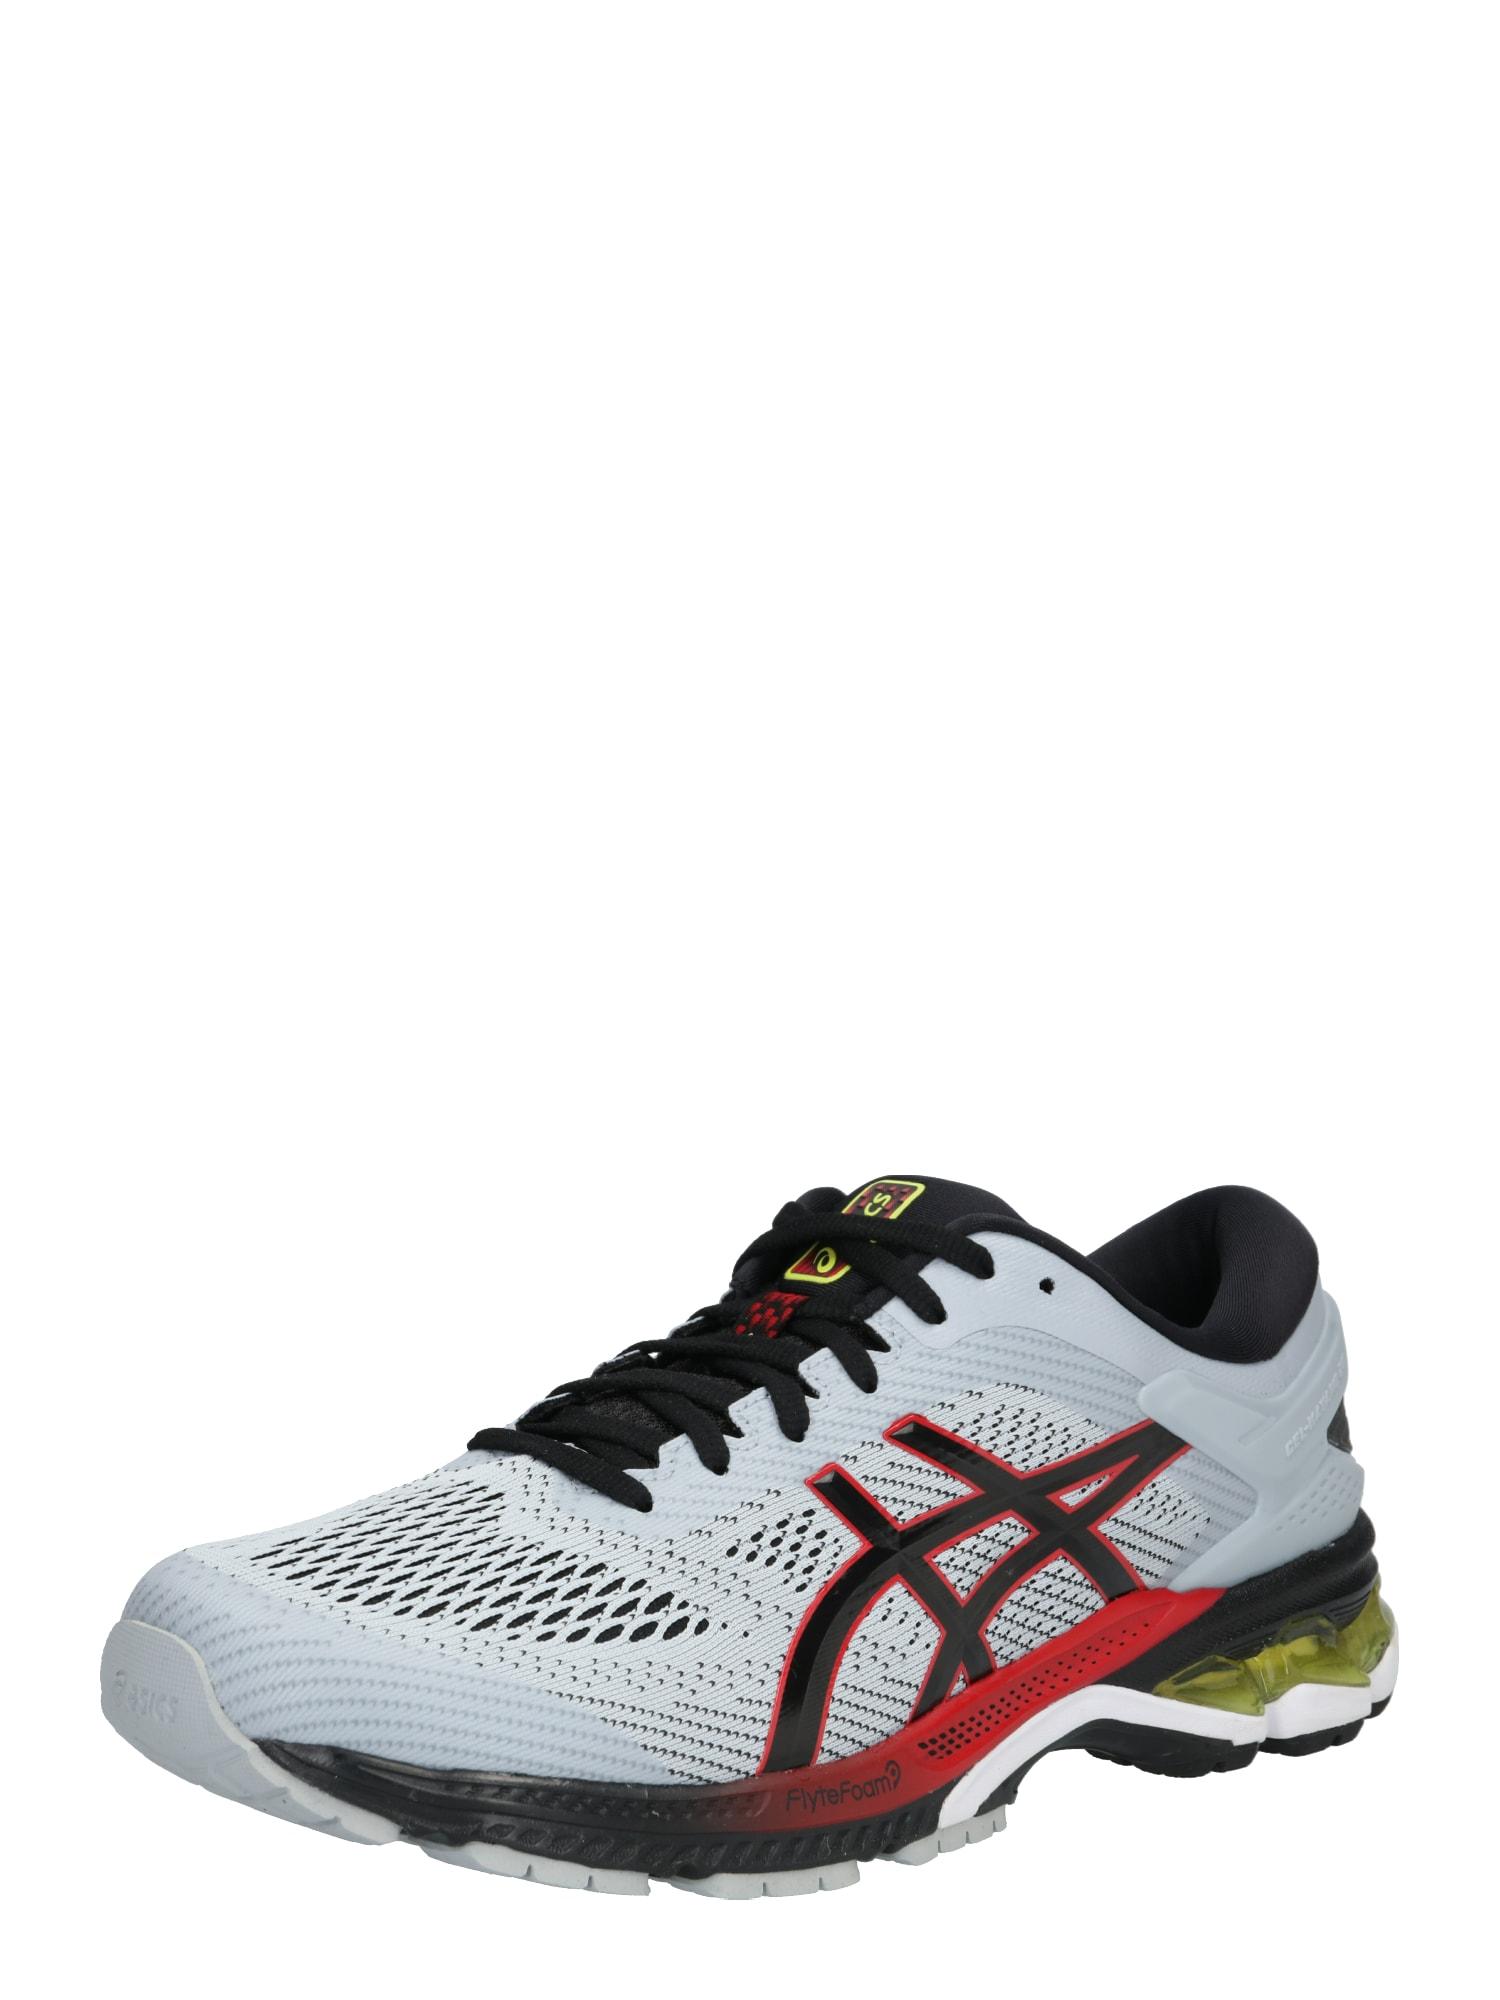 Běžecká obuv GEL-KAYANO 26 žlutá šedá černá ASICS